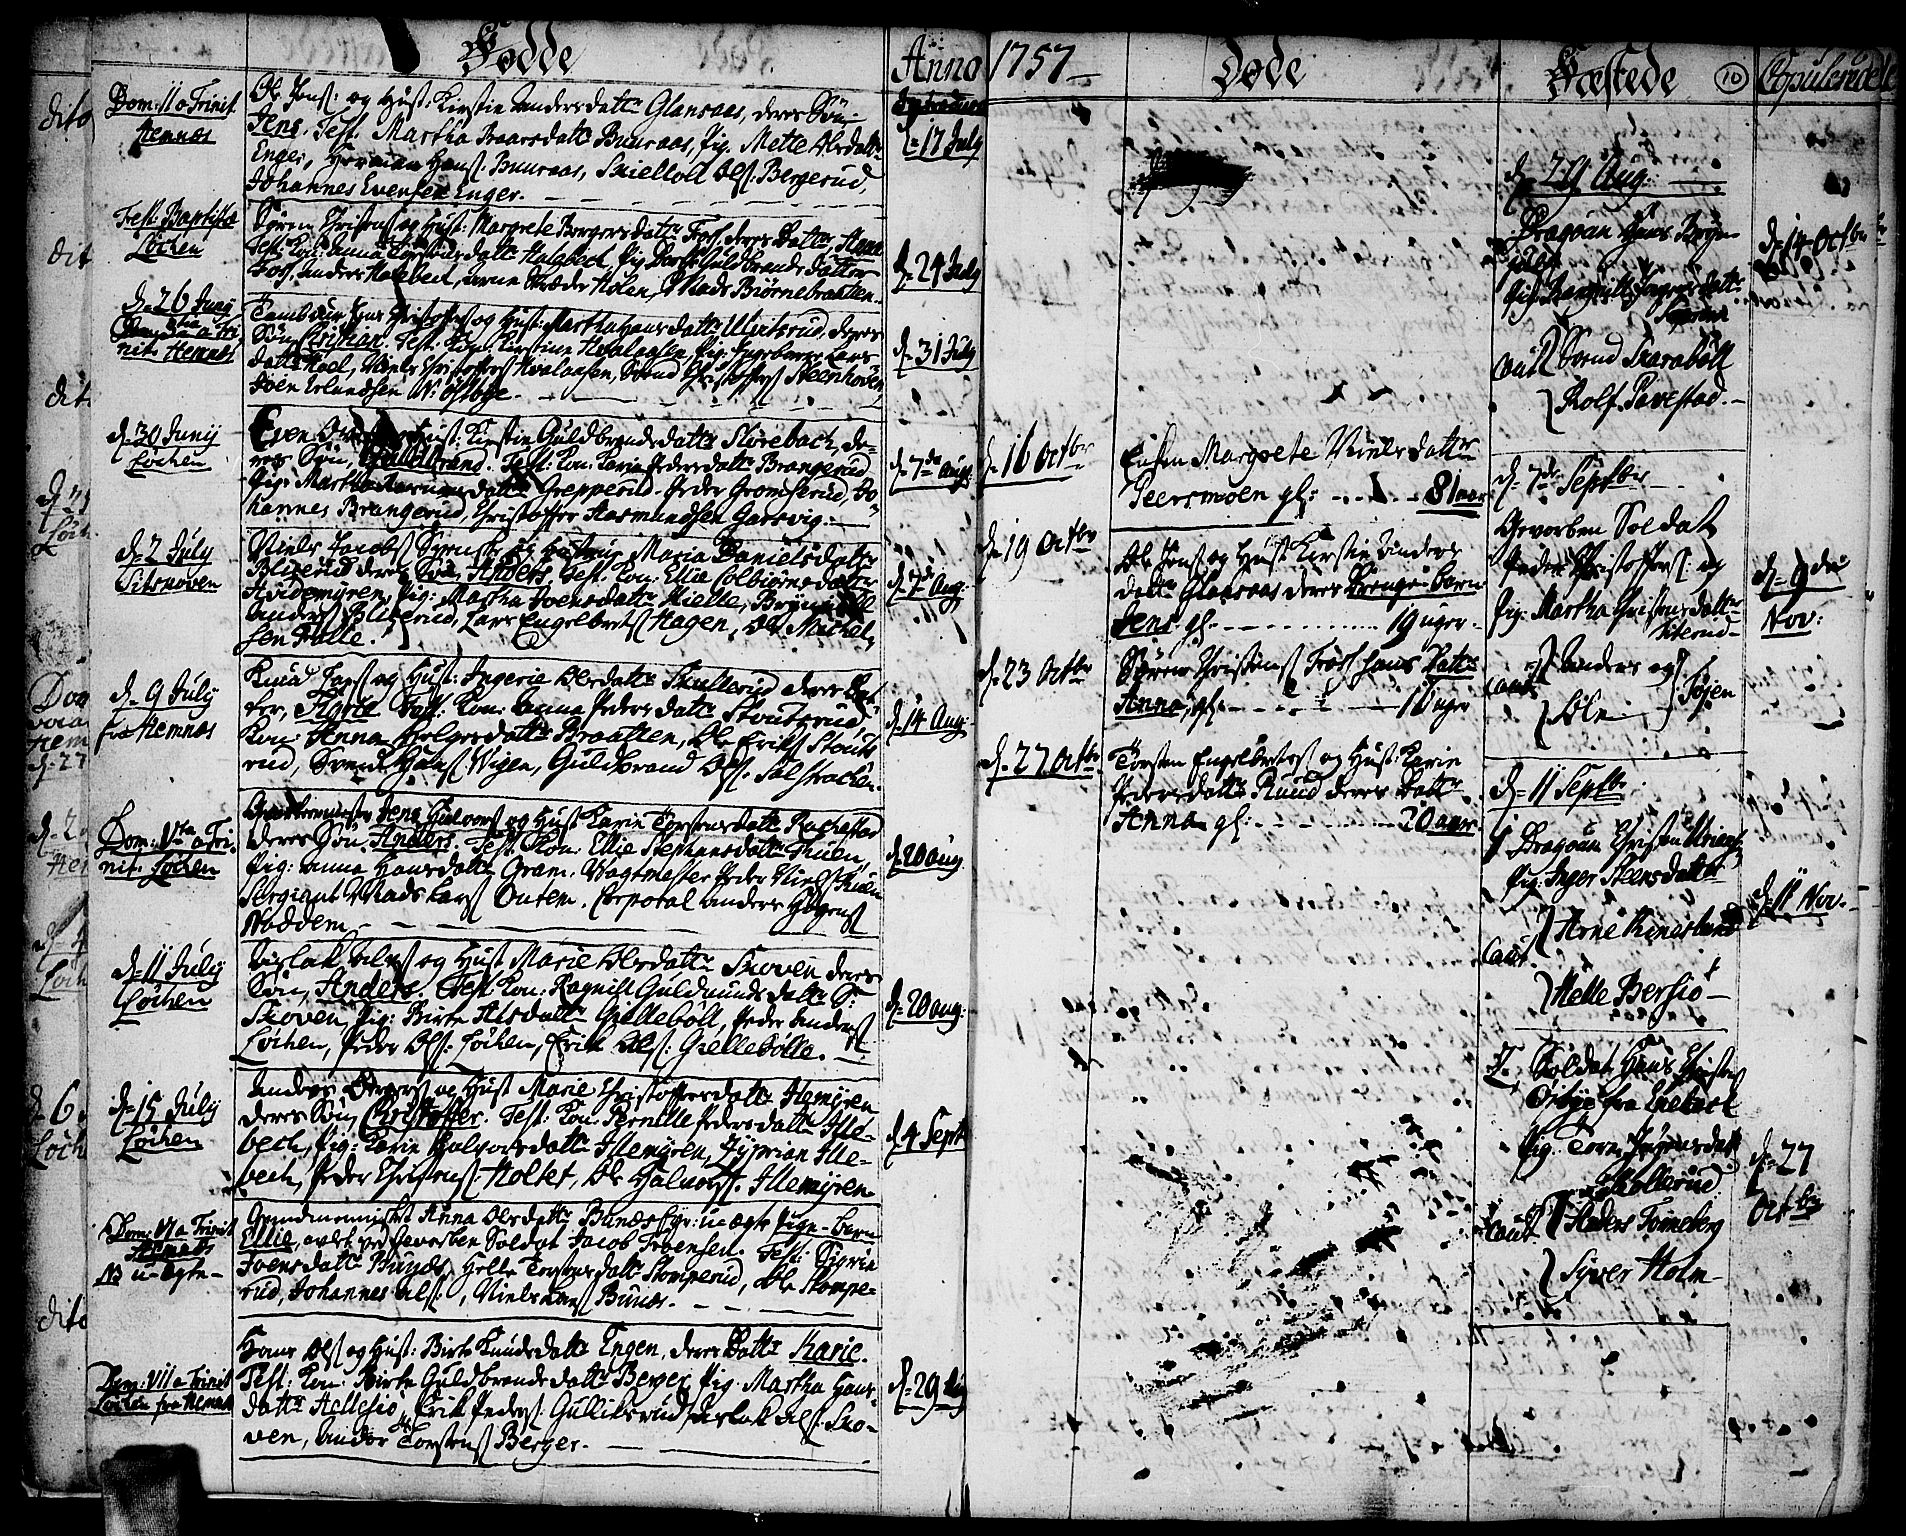 SAO, Høland prestekontor Kirkebøker, F/Fa/L0004: Ministerialbok nr. I 4, 1757-1780, s. 10